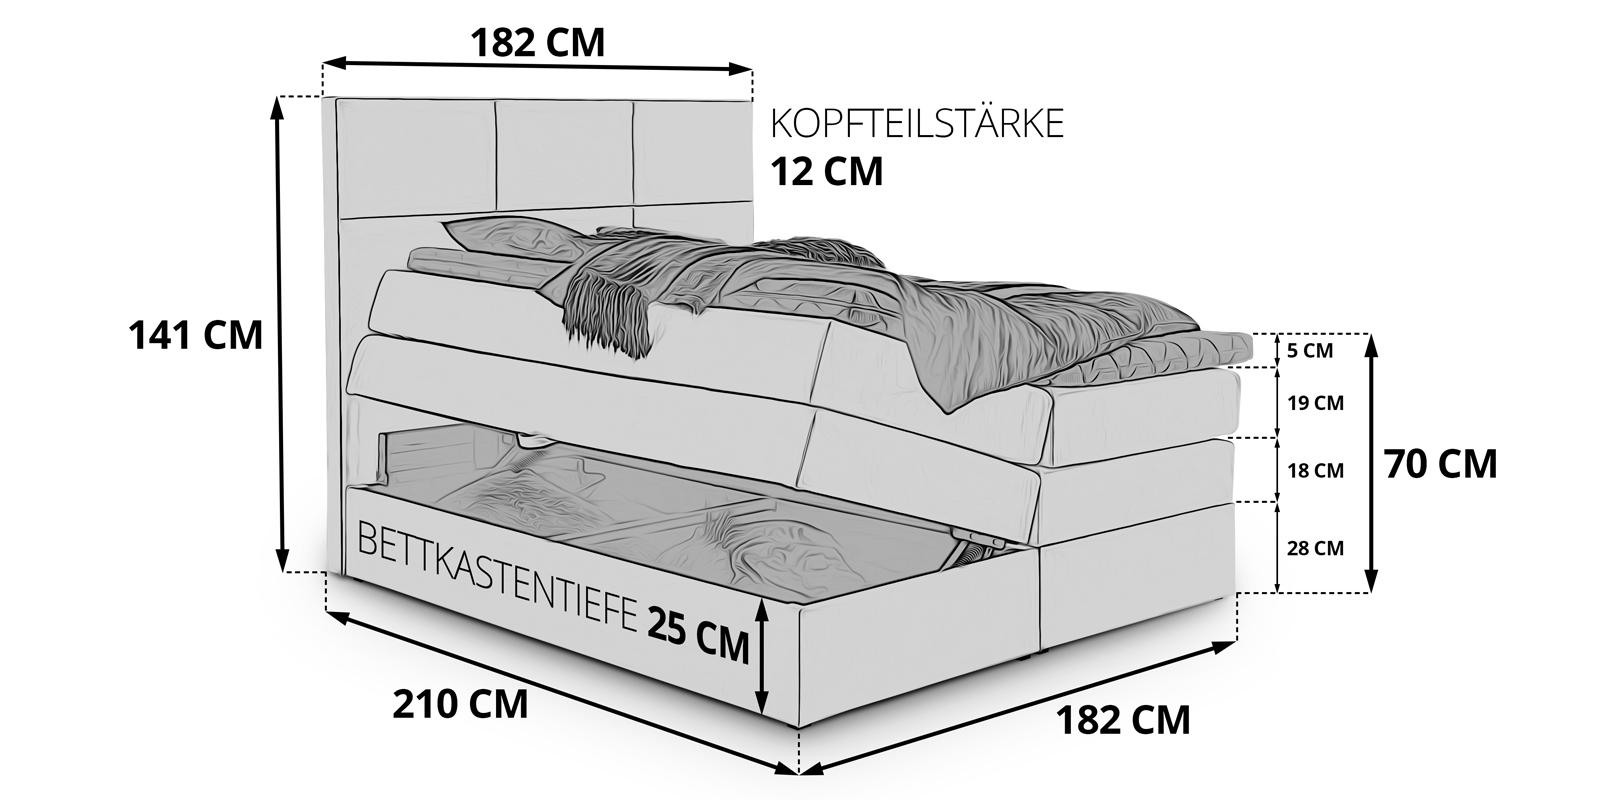 Boxspringbett Weiss Bettkasten Stauraum York 180x200 Skizze